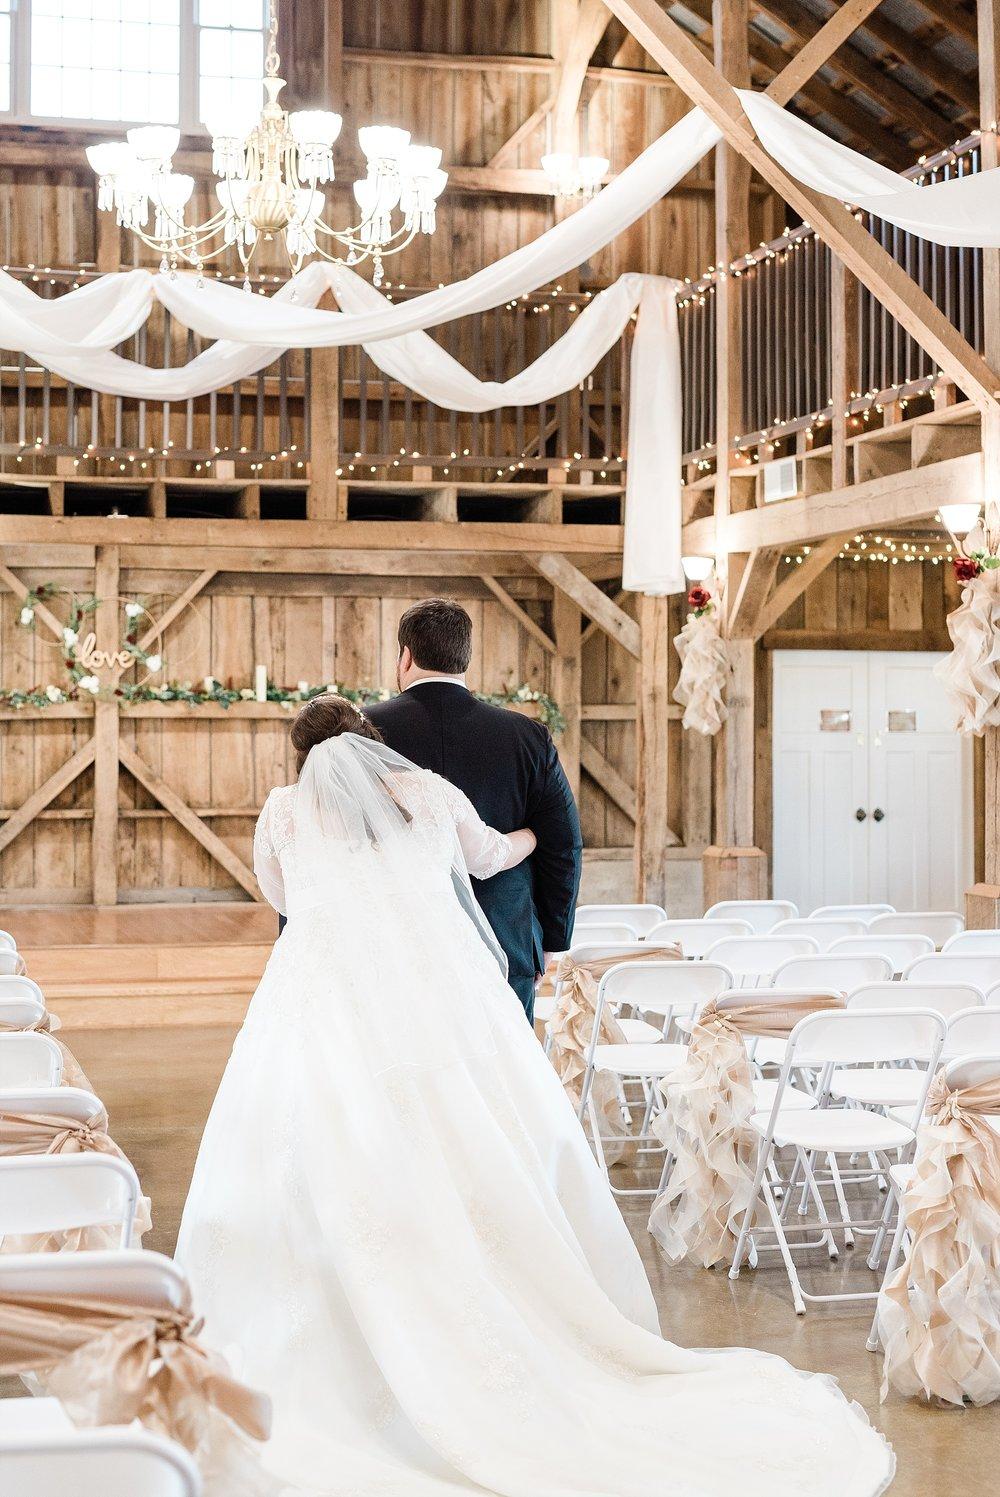 Golden Winter Wedding at The Legacy Barn in Barnett Missouri by Kelsi Kliethermes Photography Columbia Missouri Wedding Photographer_0022.jpg